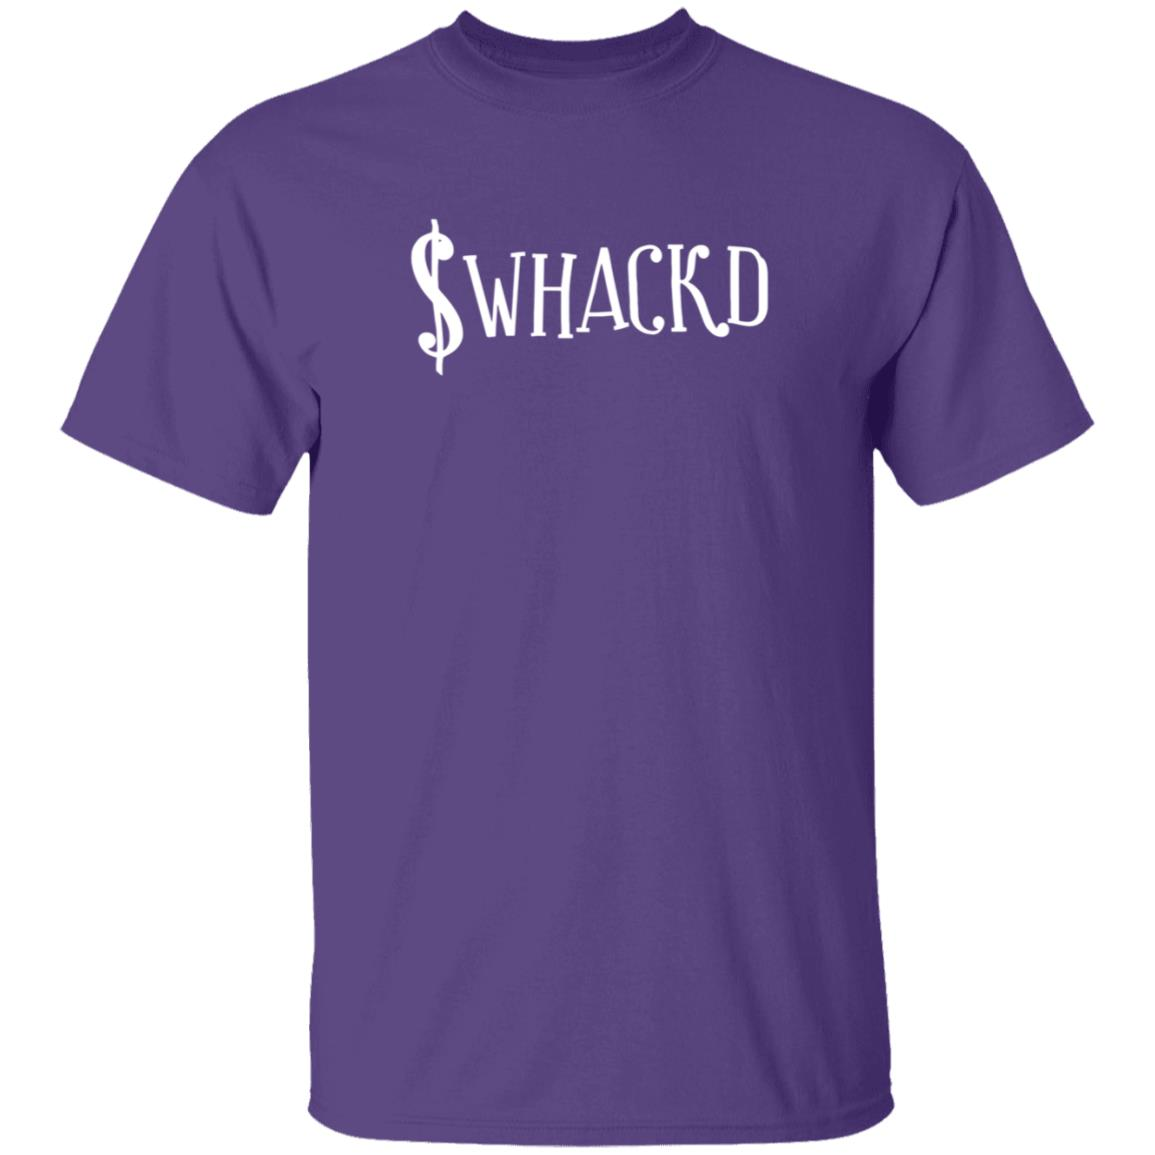 $Whackd T Shirt John Mcafee Did Not Kill Himself